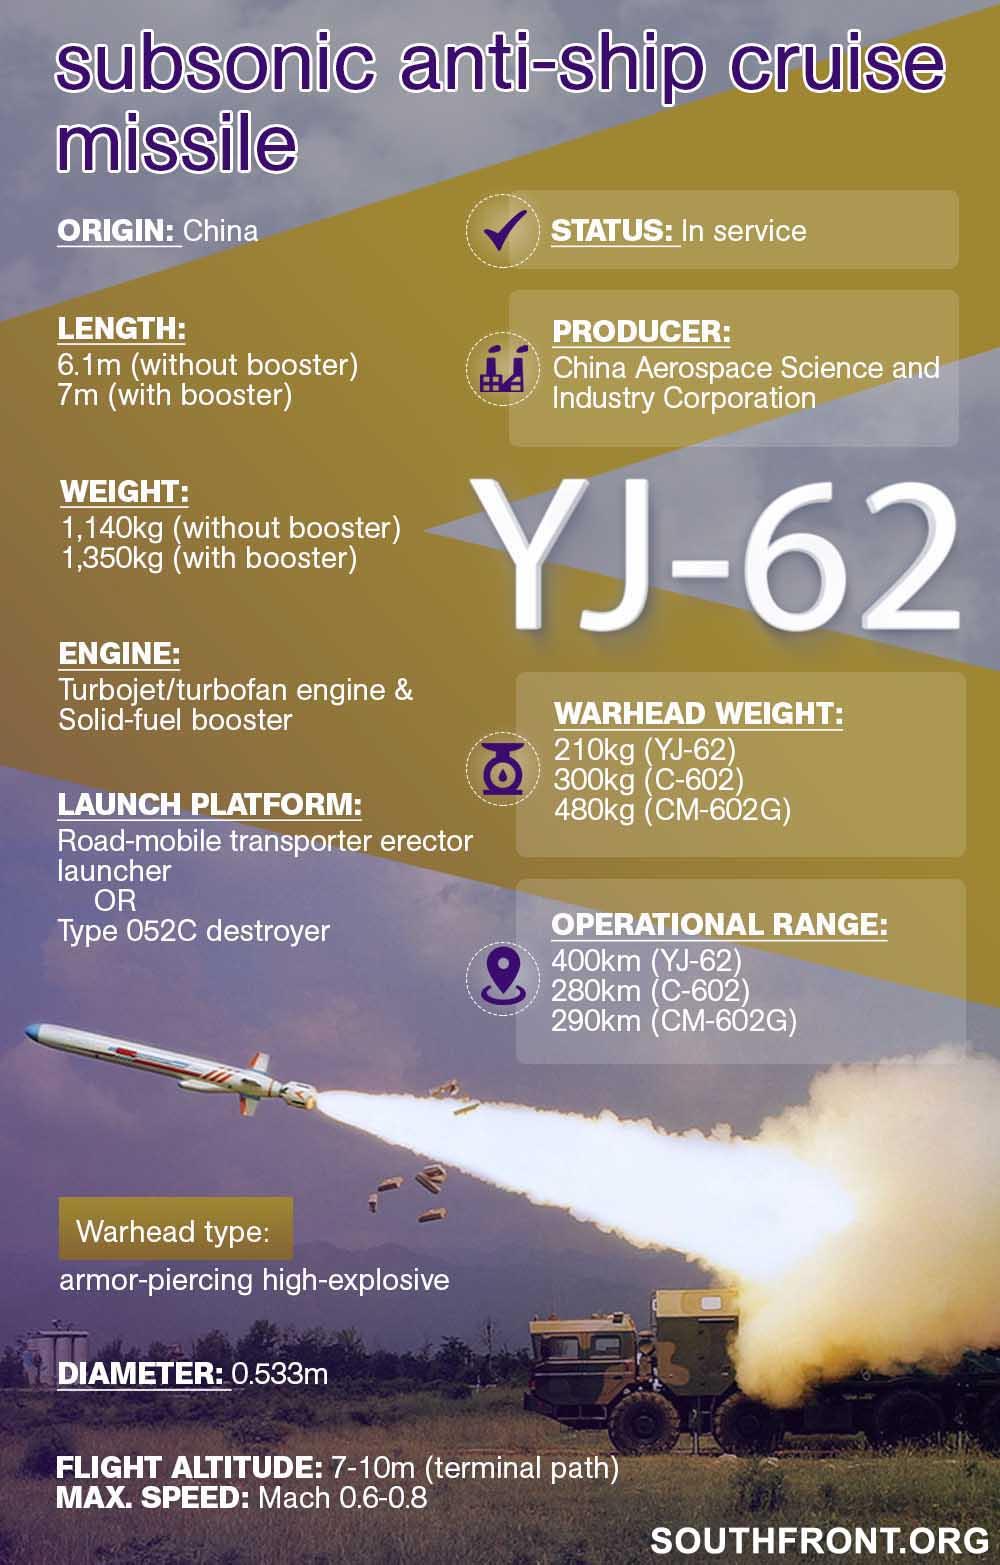 China's YJ-62 Subsonic Anti-Ship Cruise Missile